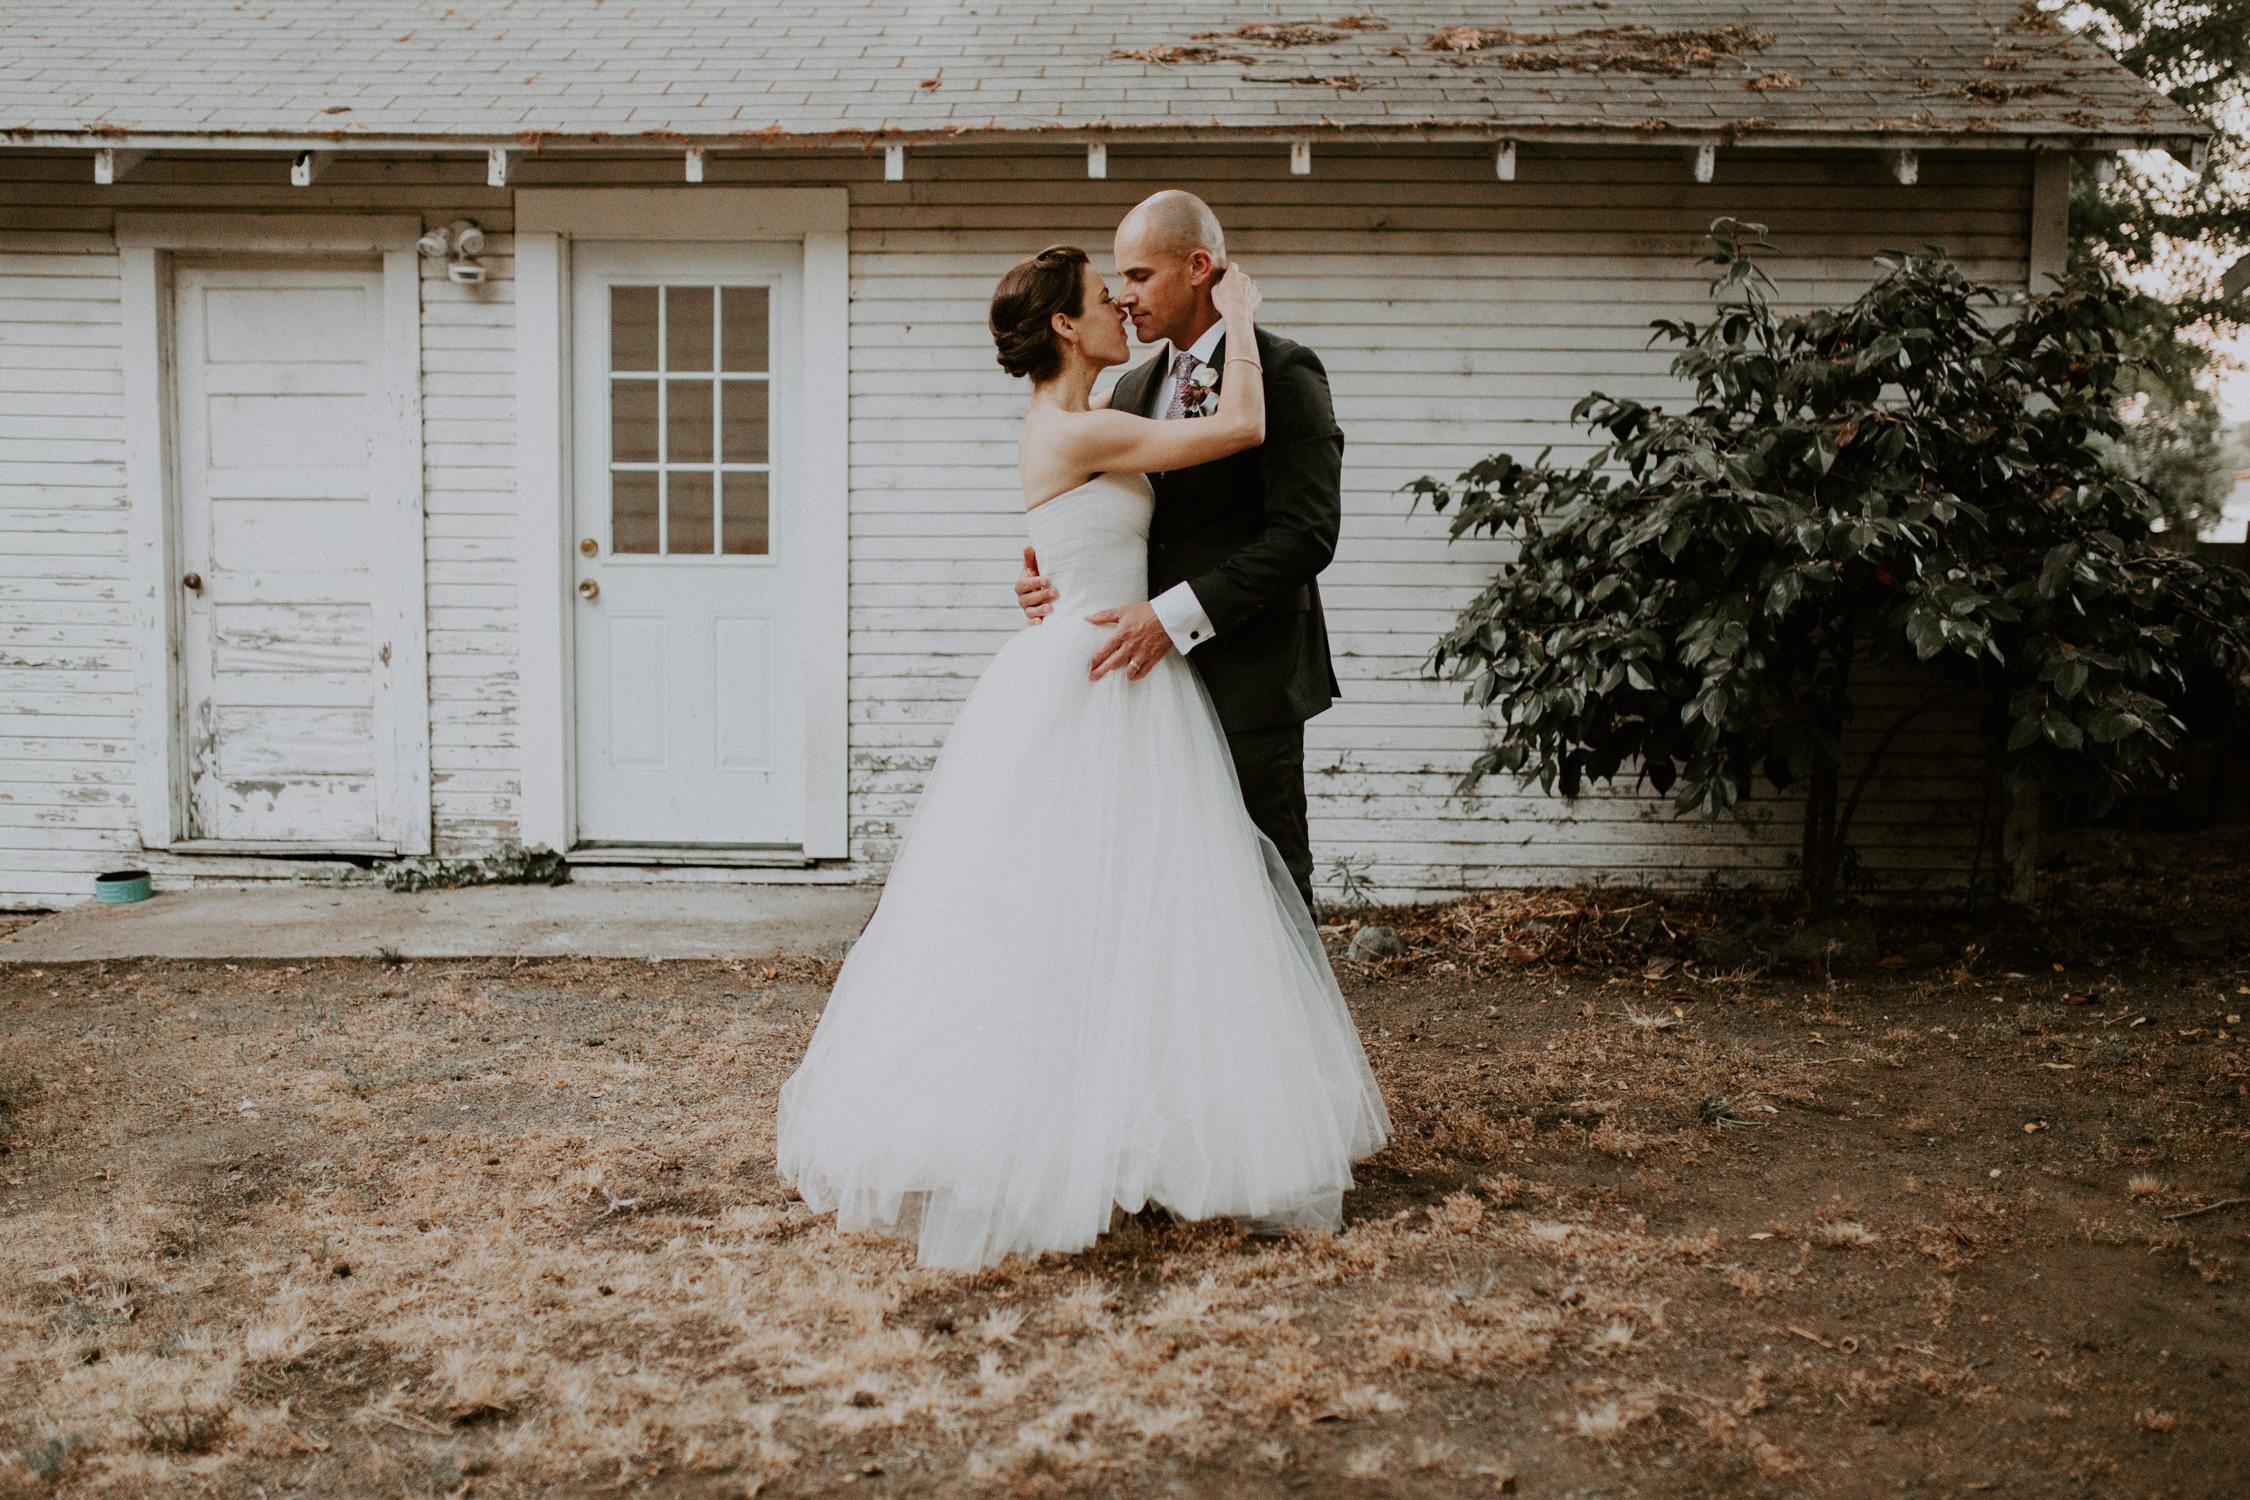 couple-wedding-marin-french-cheese-petaluma-california_0119.jpg